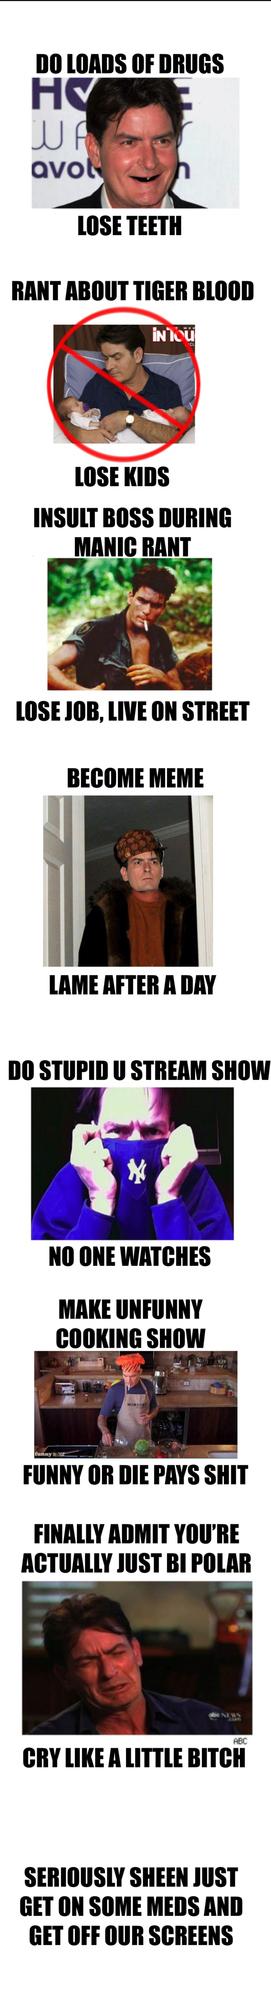 "Charlie Sheen ""LOSING!"""